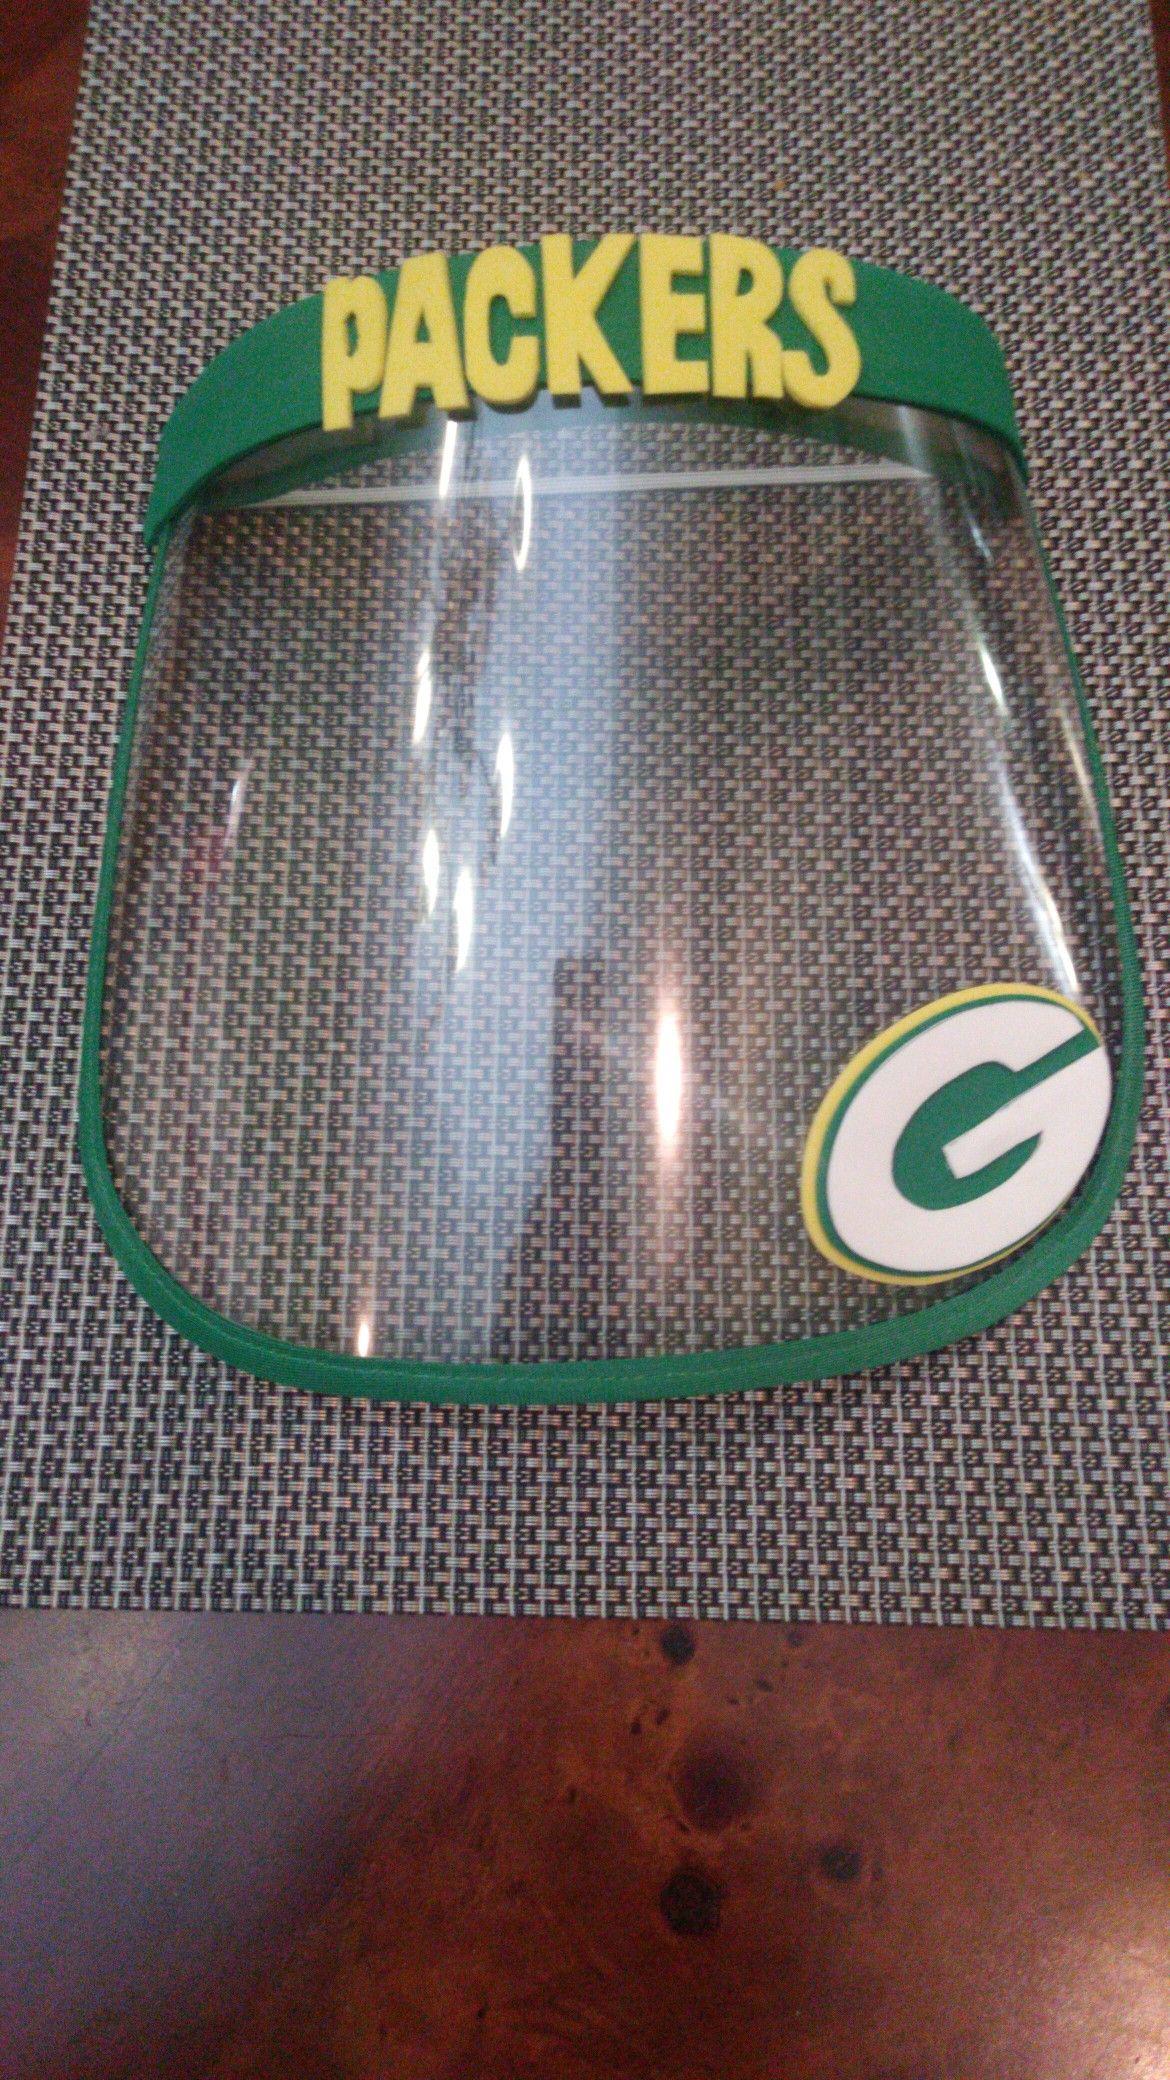 Packers Face Shield Packers Careta De Acetato In 2020 Face Mask Kiddos Packers